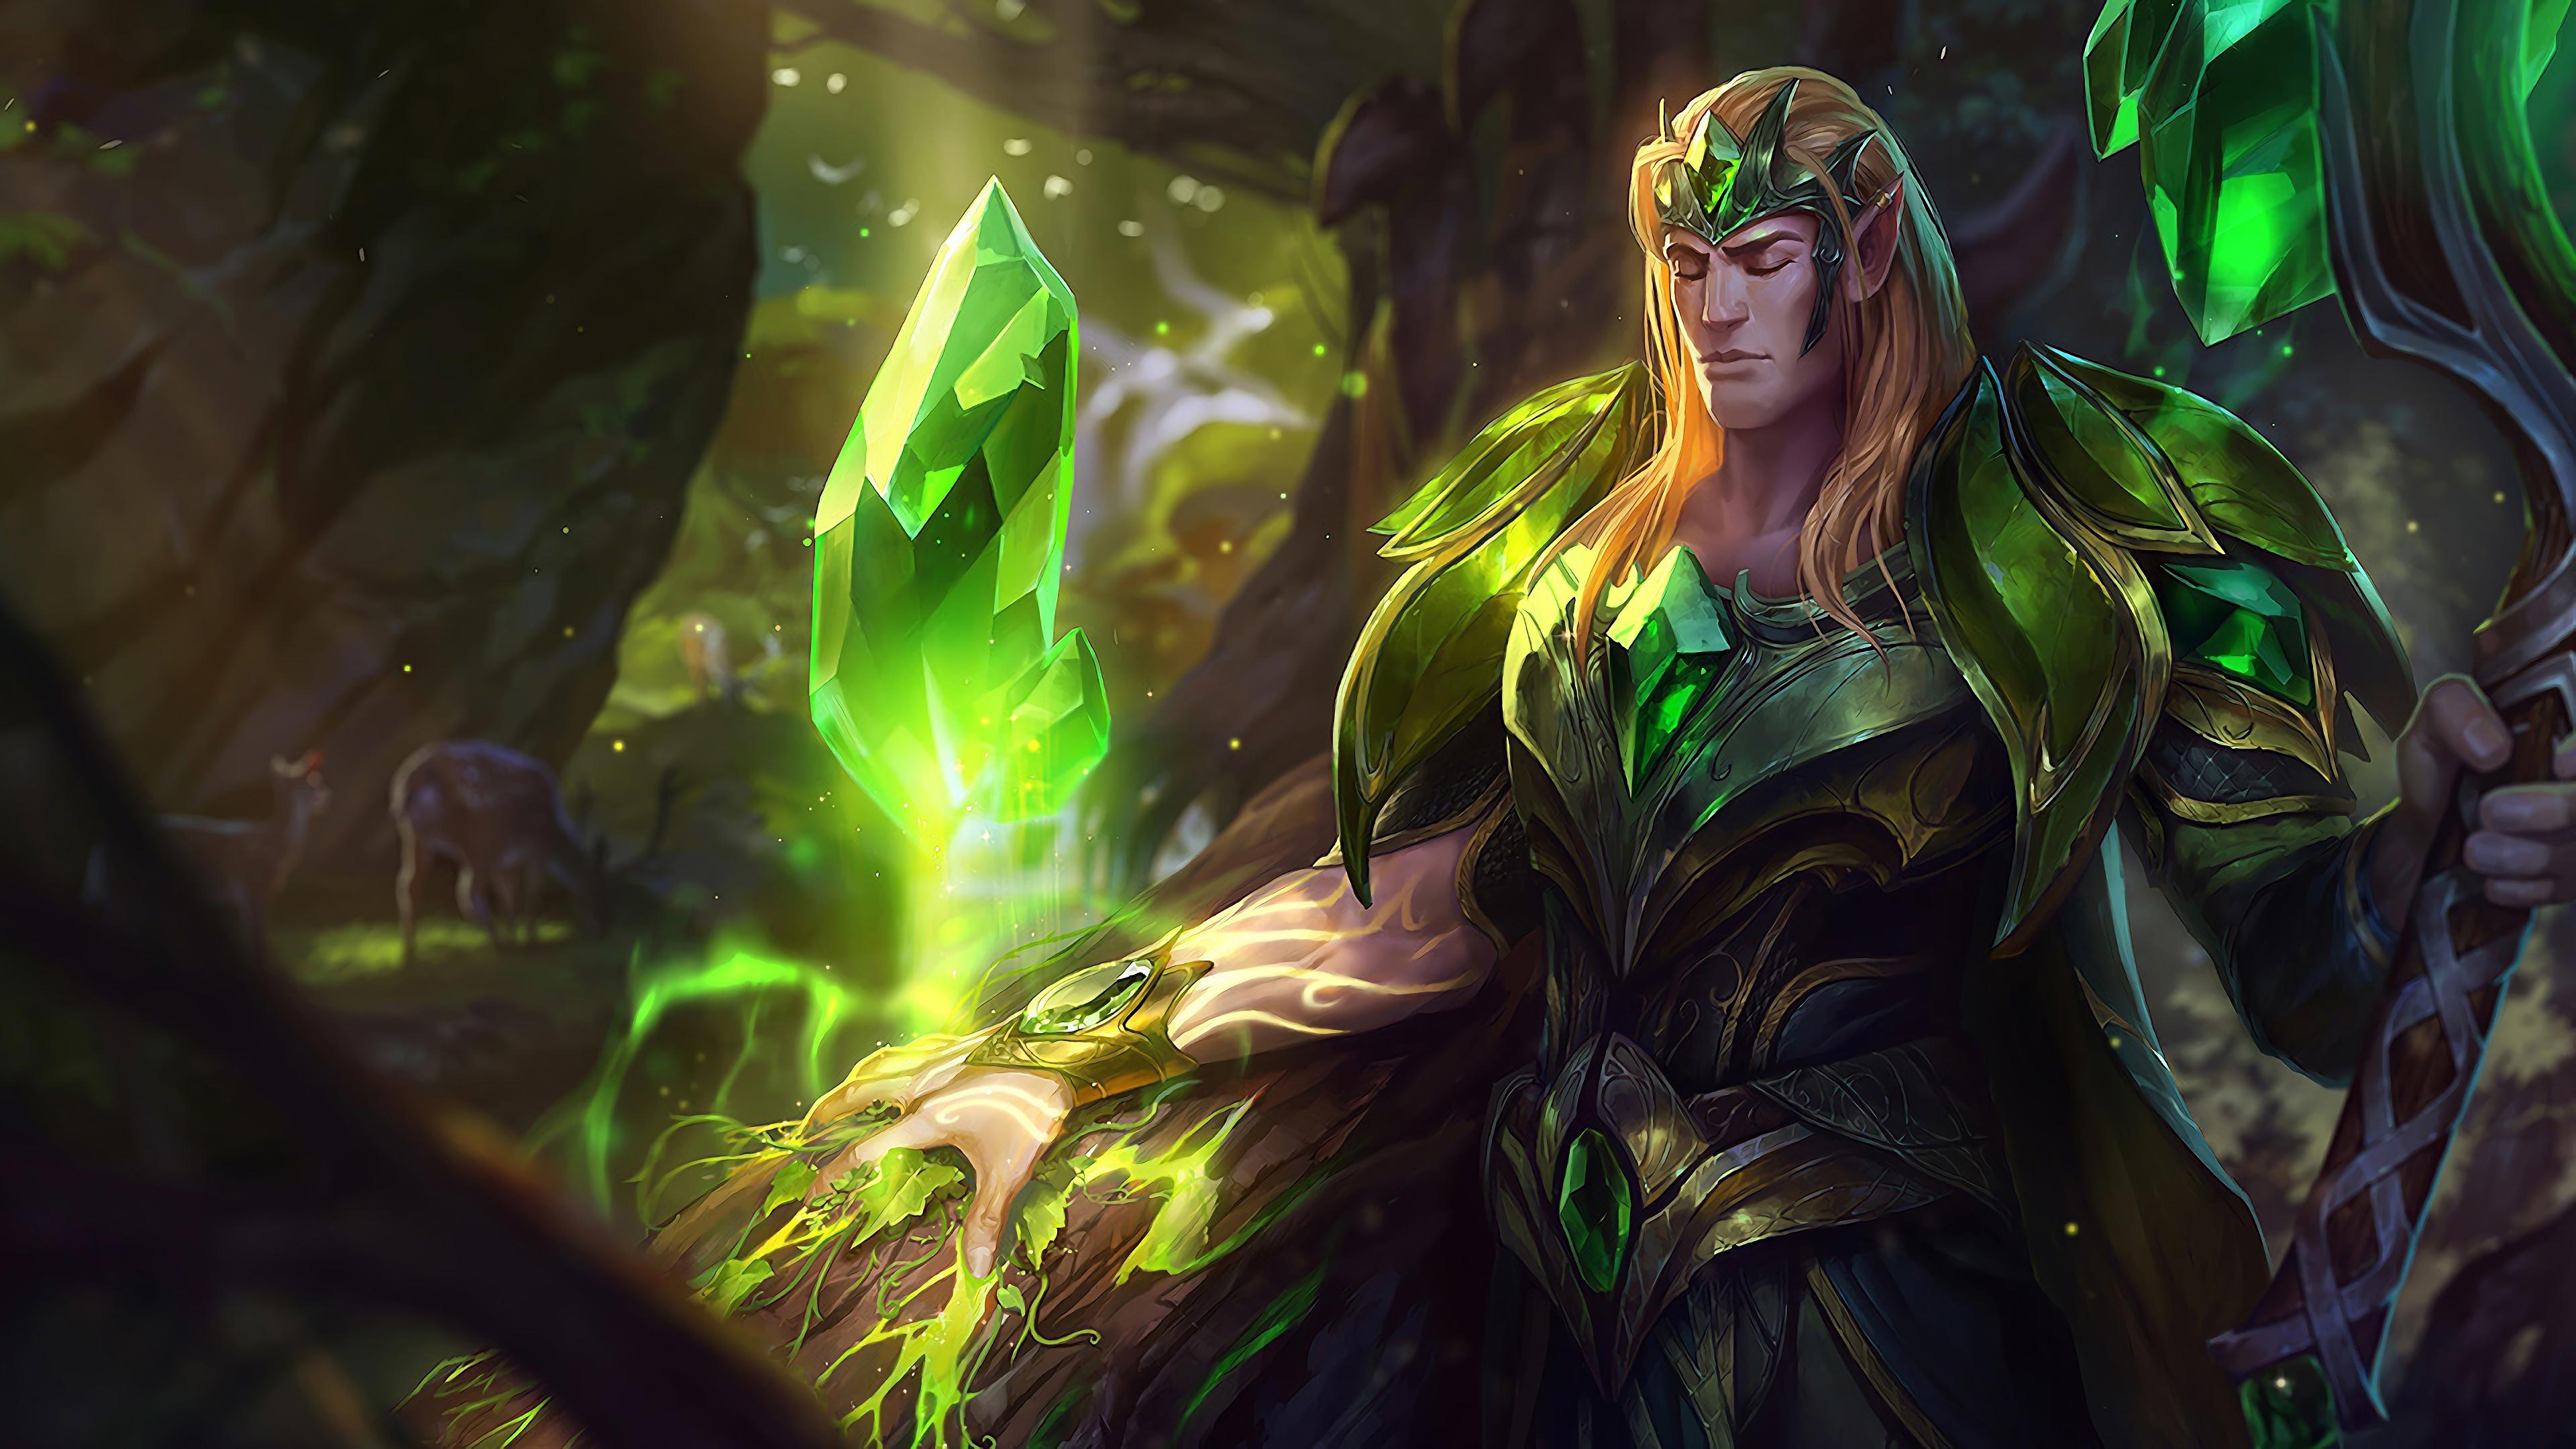 emerald taric lol splash art league of legends 1574100632 - Emerald Taric LoL Splash Art League of Legends - Taric, league of legends